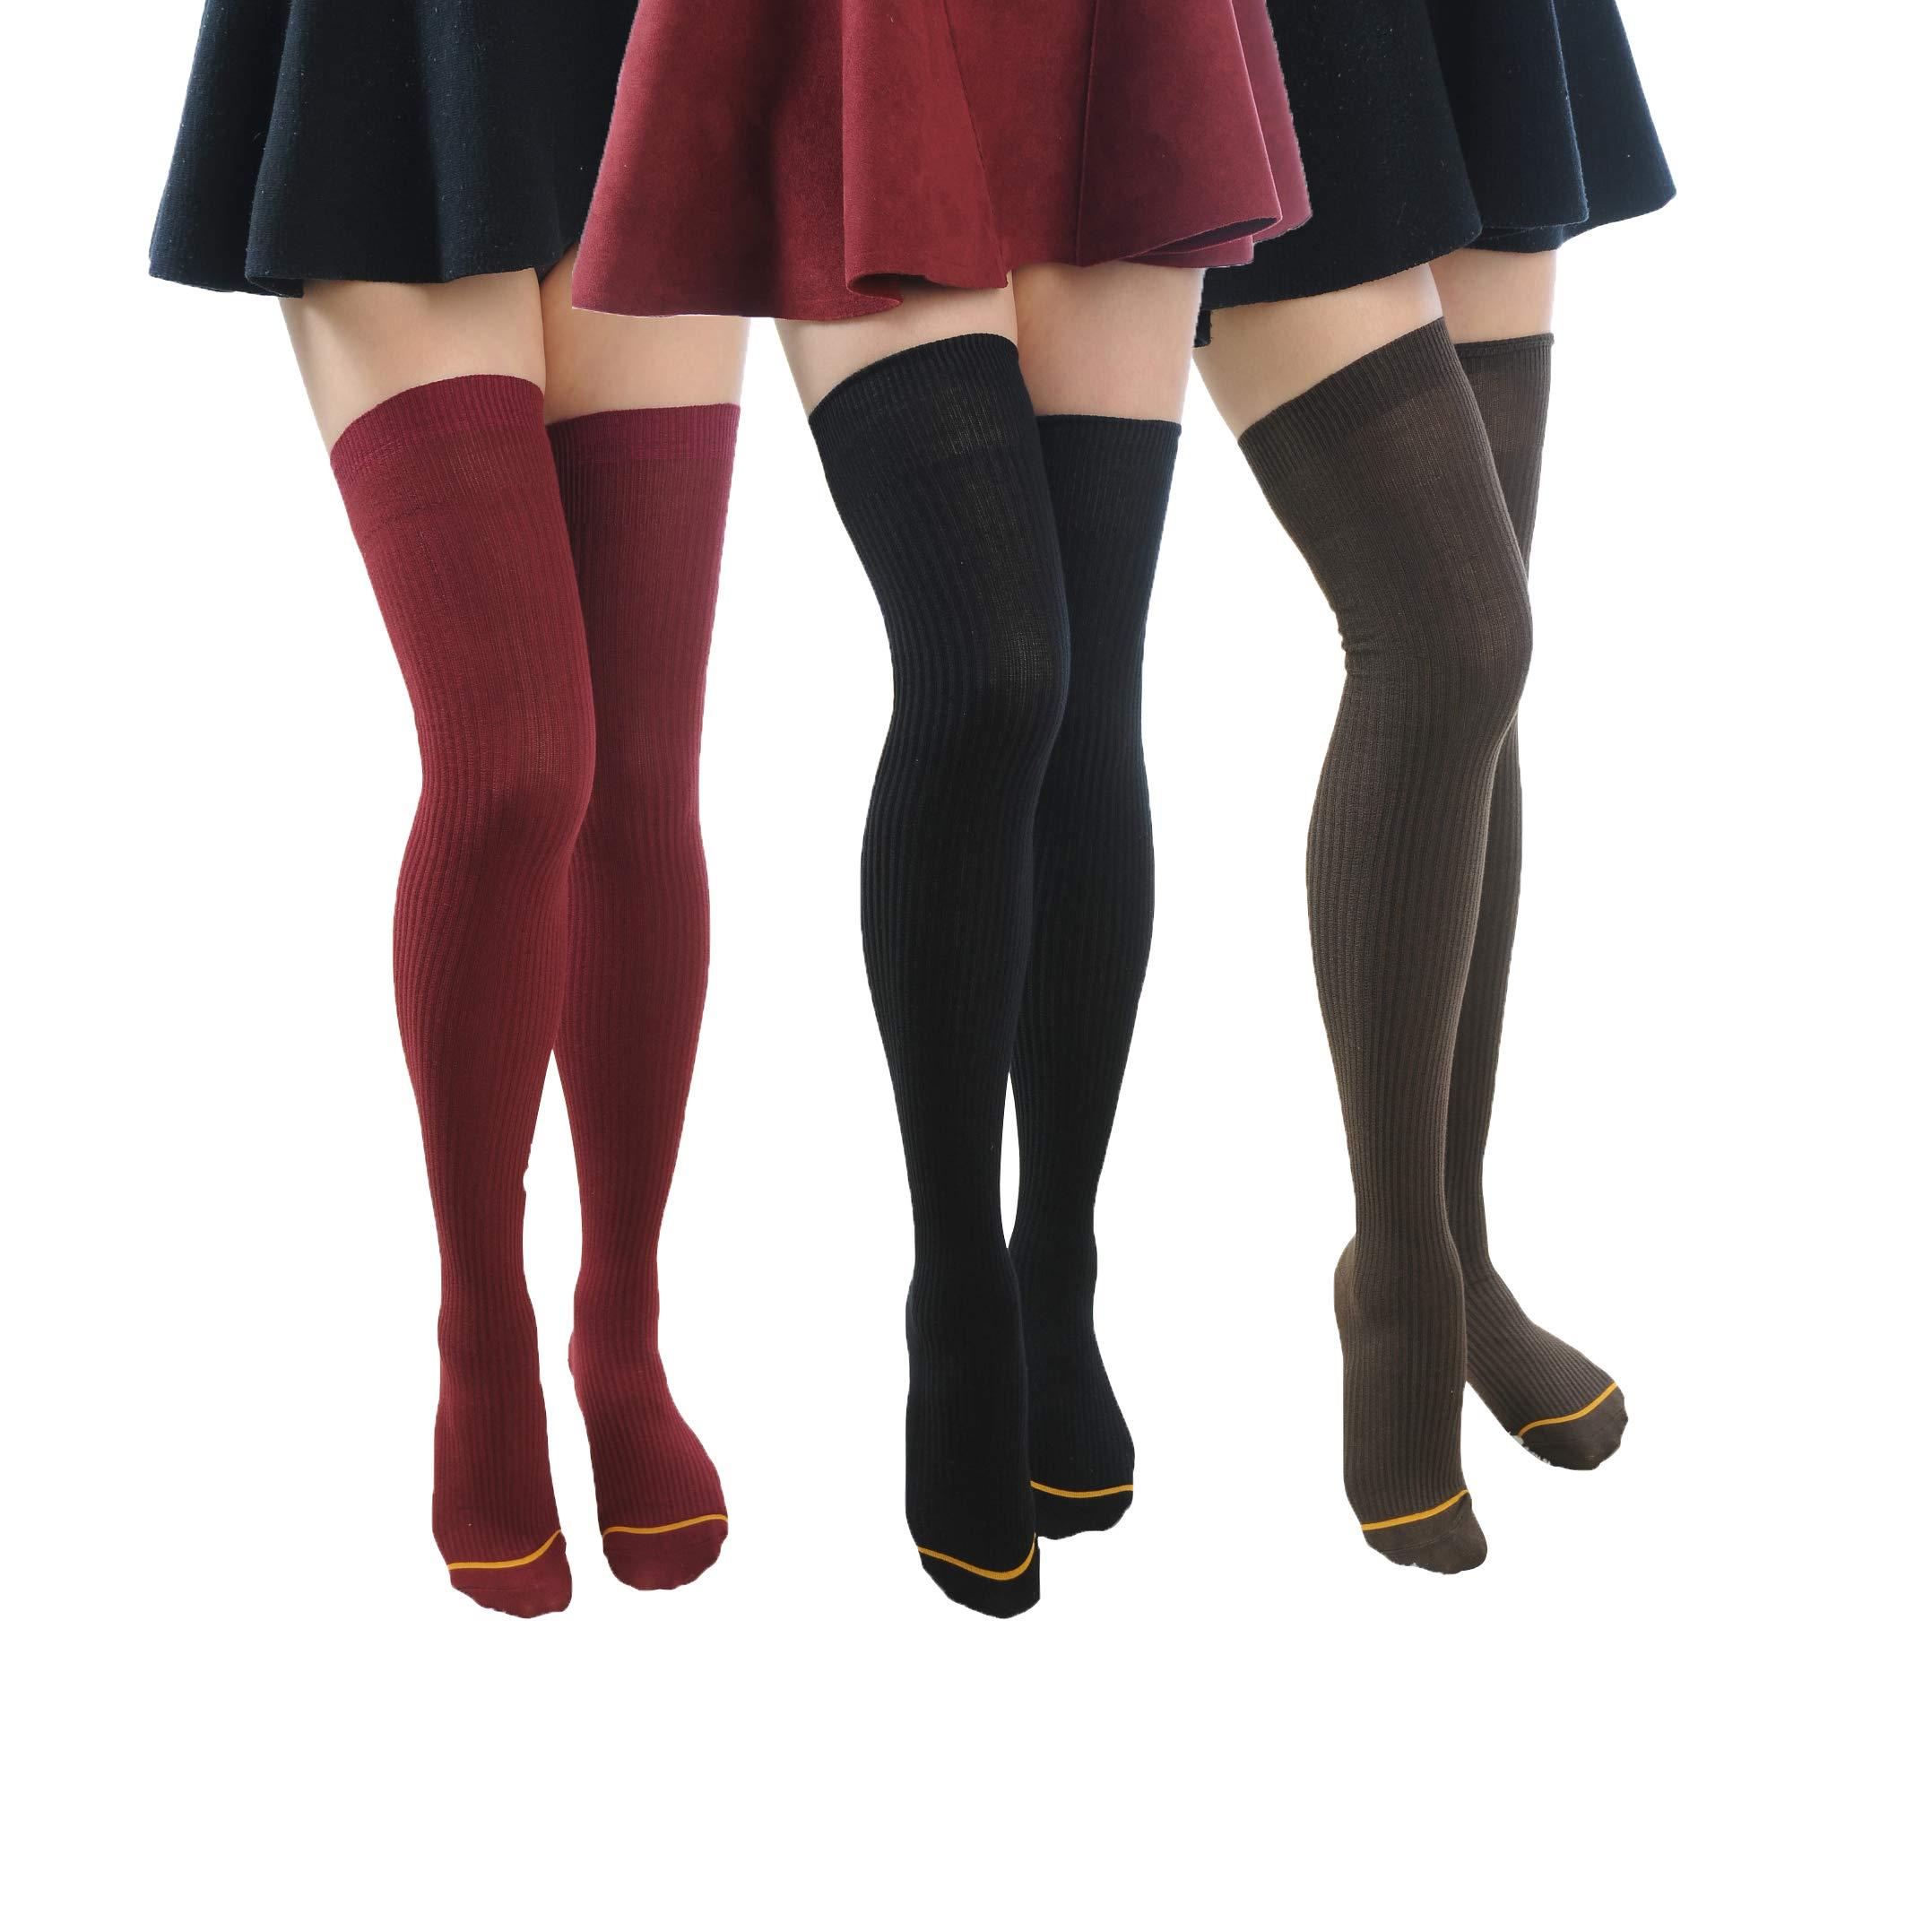 Tengo Women Girls Cotton Thigh High Socks Juniors Knit Boot Socks Leg Warmer 1-3 Packs(Black,Brown,Burgundy)